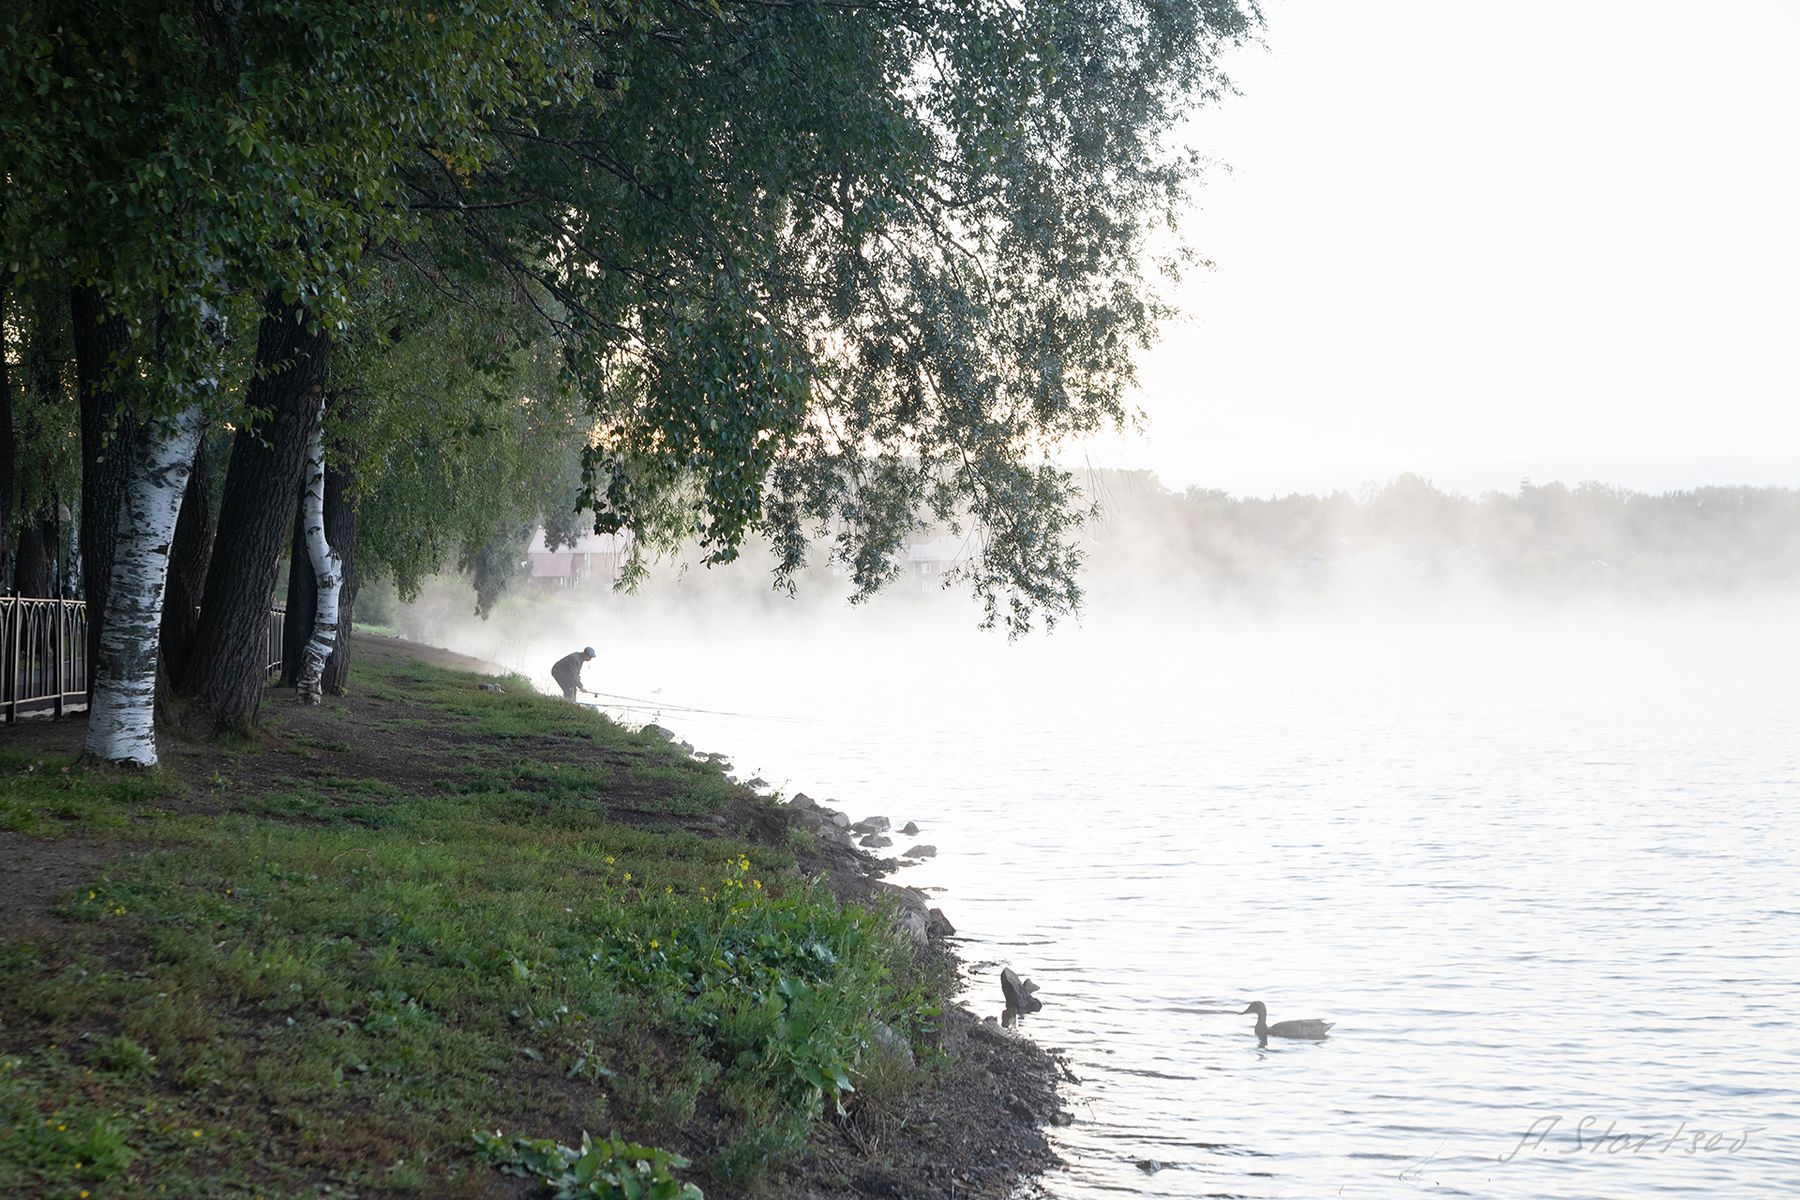 Туманное утро утро рассвет пруд озеро вода небо лето пейзаж природа Пермский_край Лысьва туман